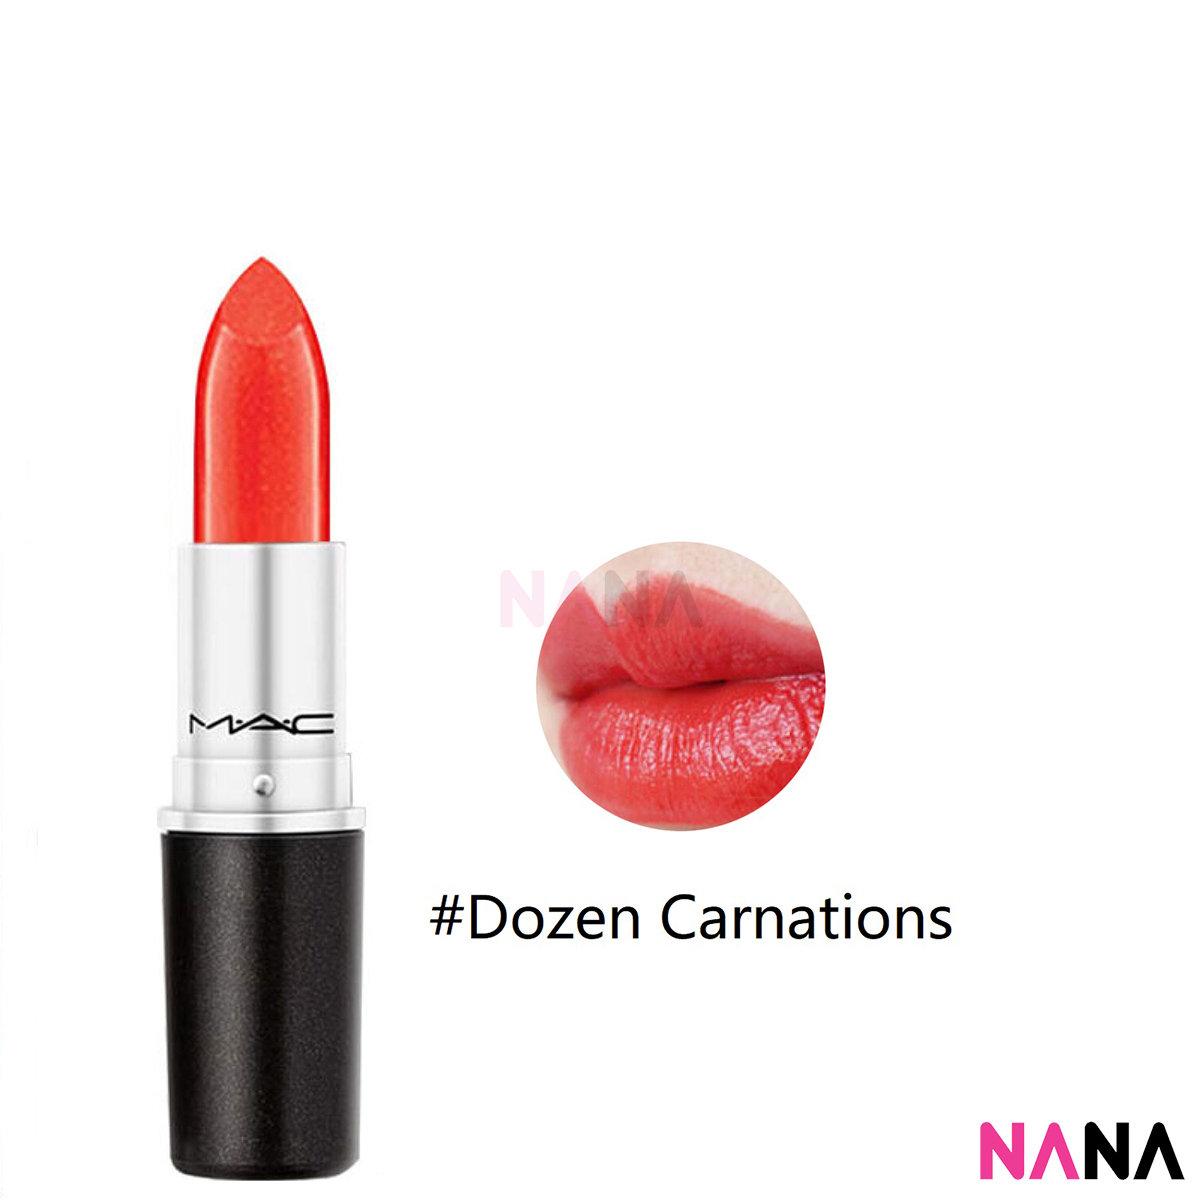 水漾亮色唇膏 - Dozen Carnations 3g